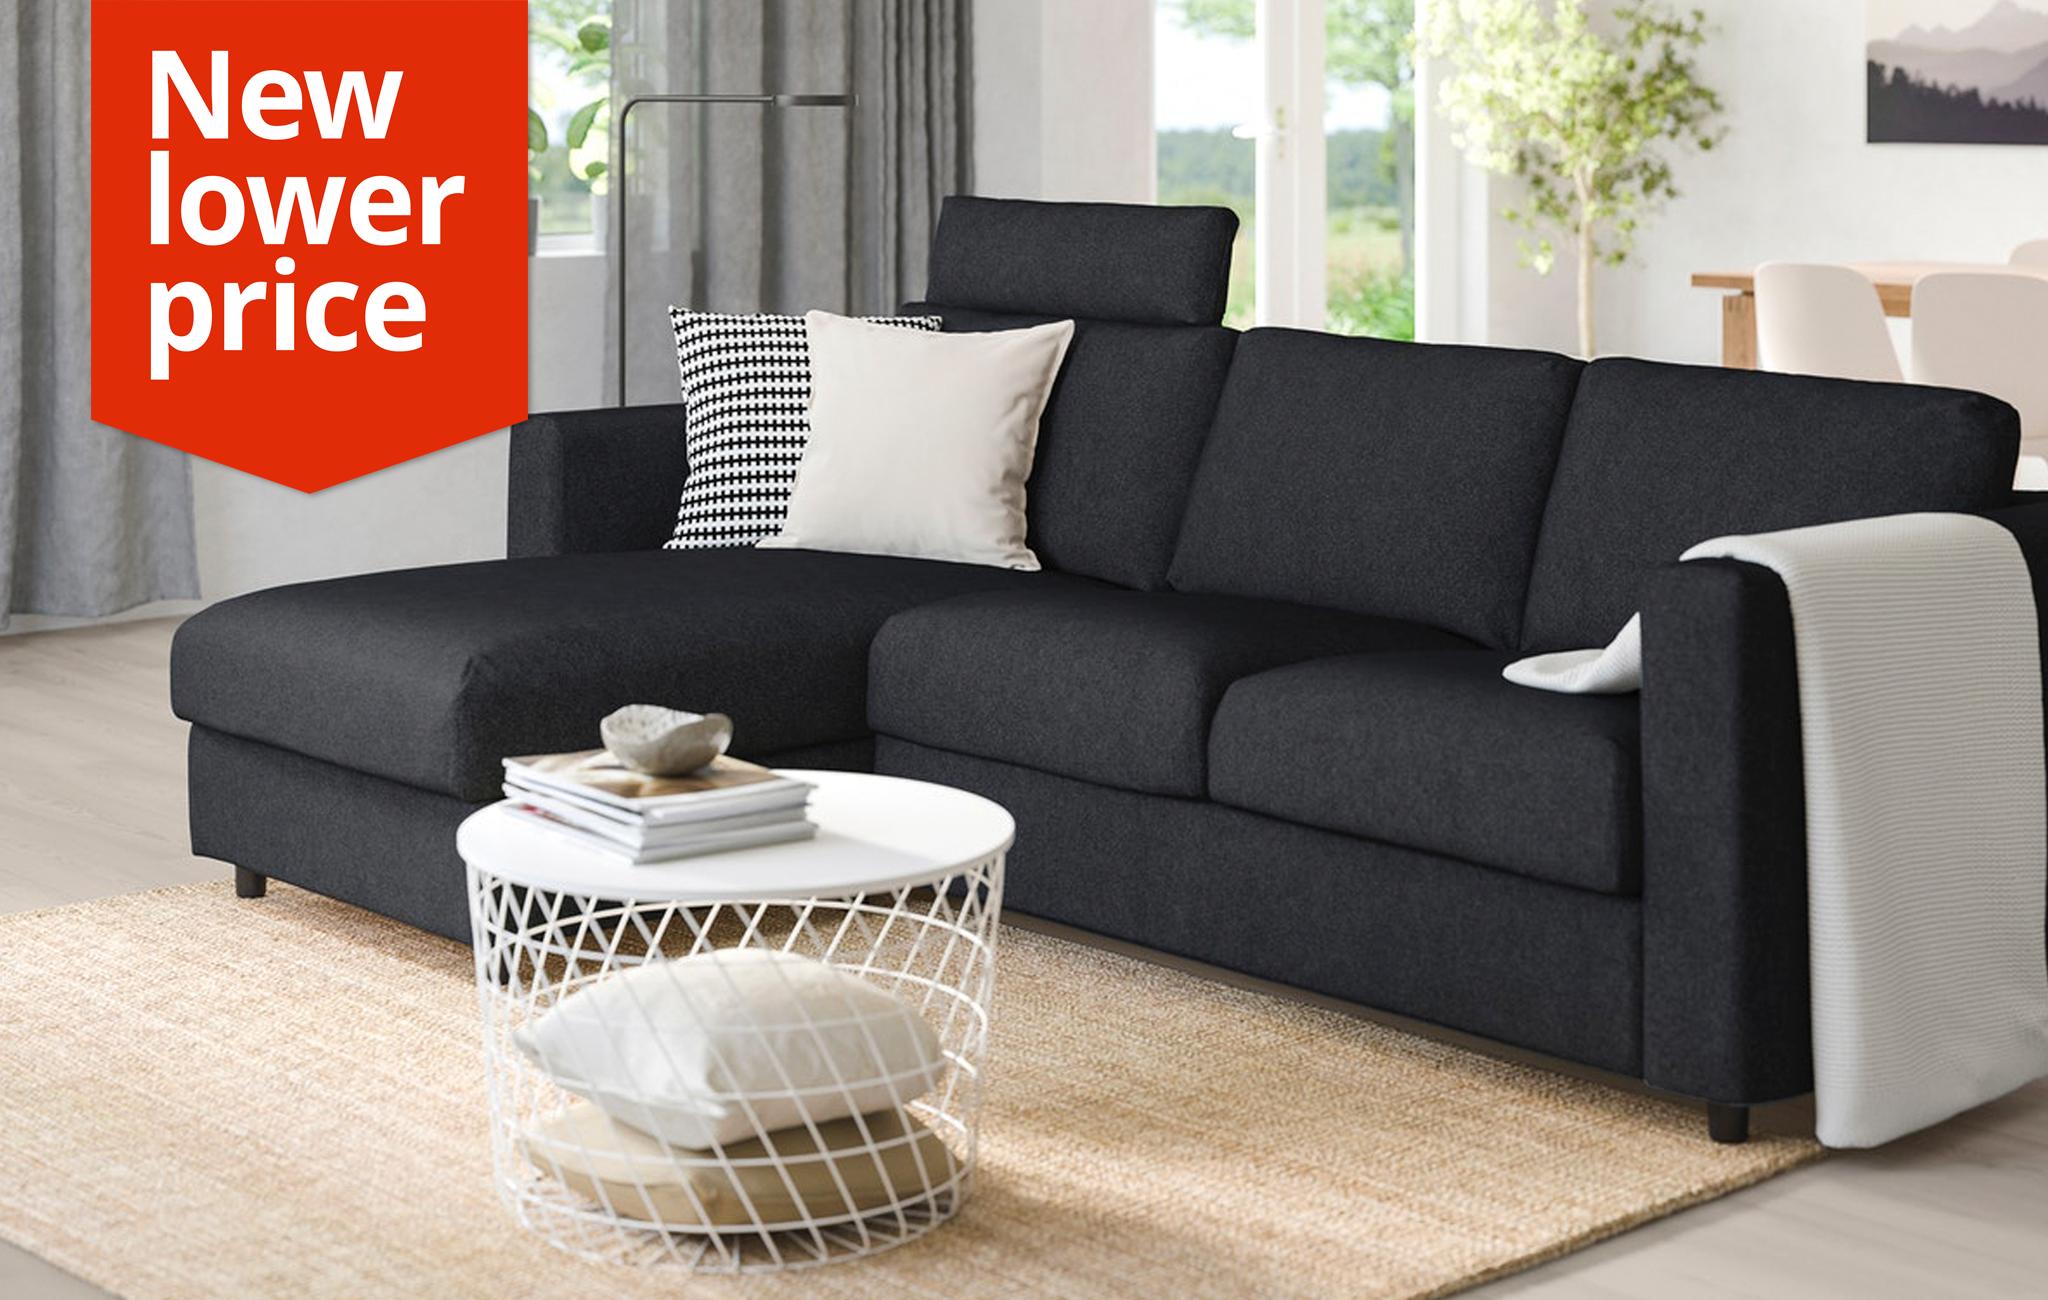 VIMLE 3-seat sofa, with chaise longue with headrest, Tallmyra black/grey